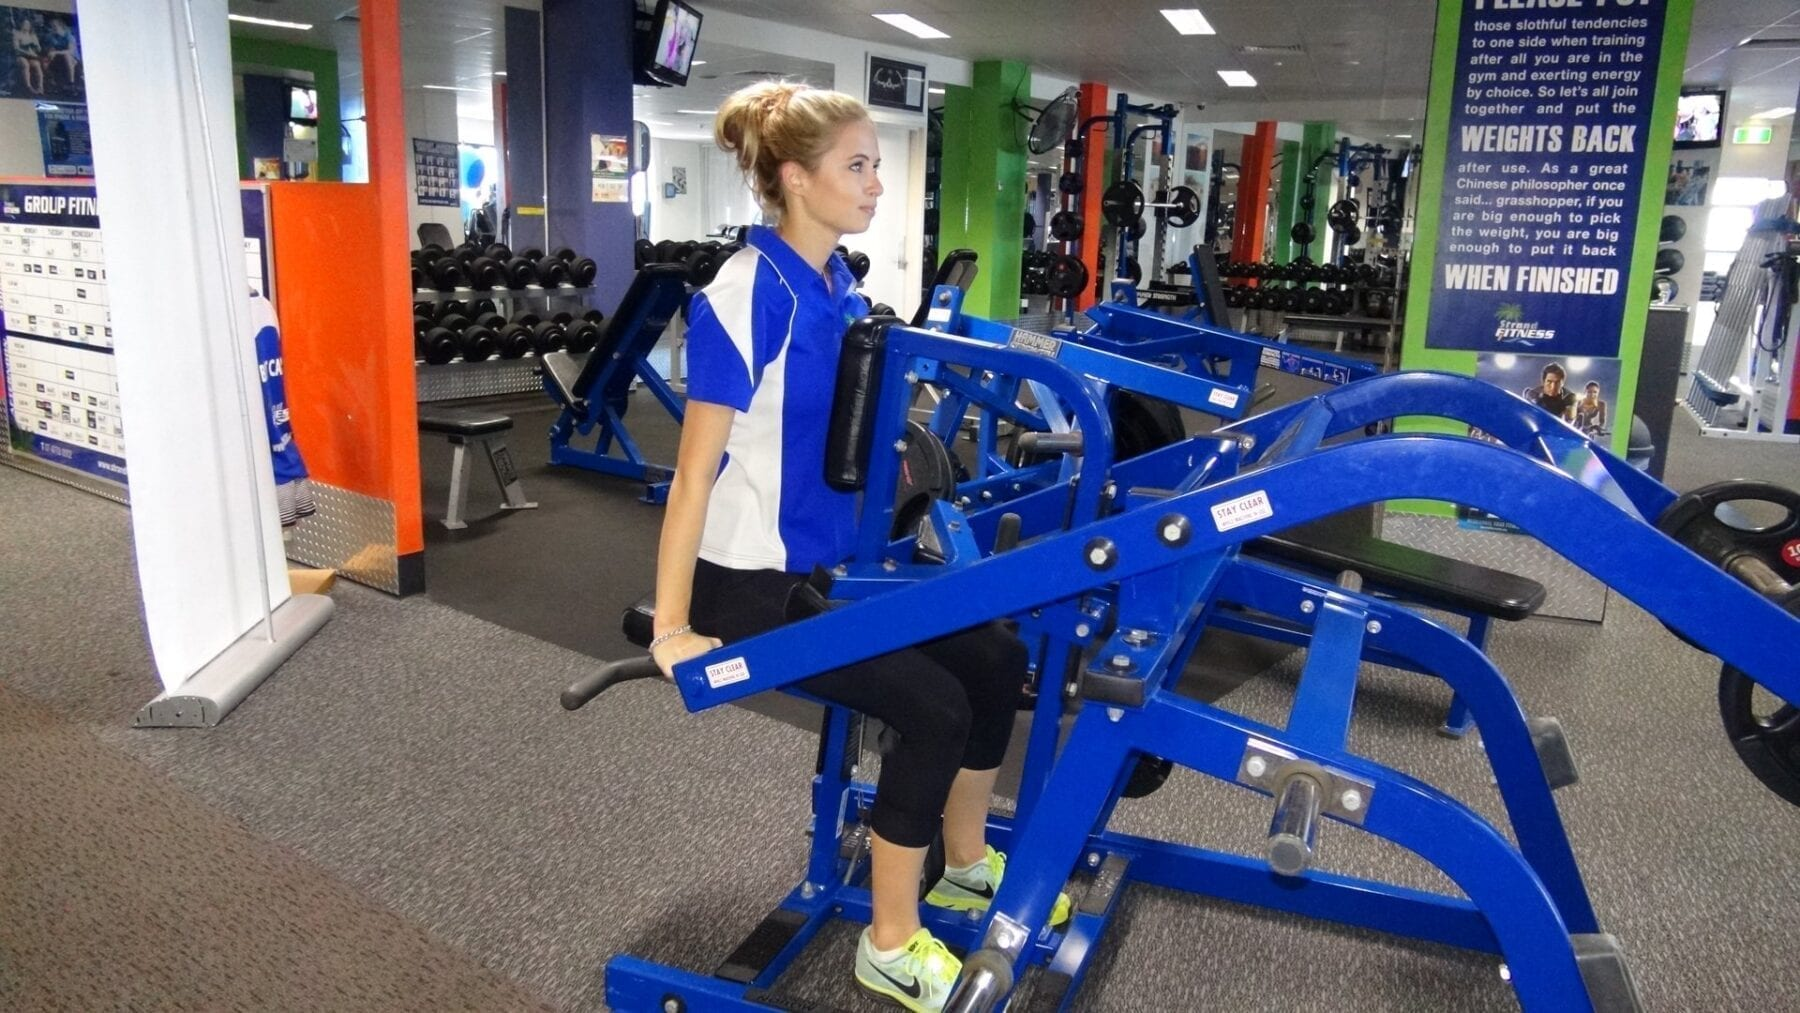 Fitness Institute Dips